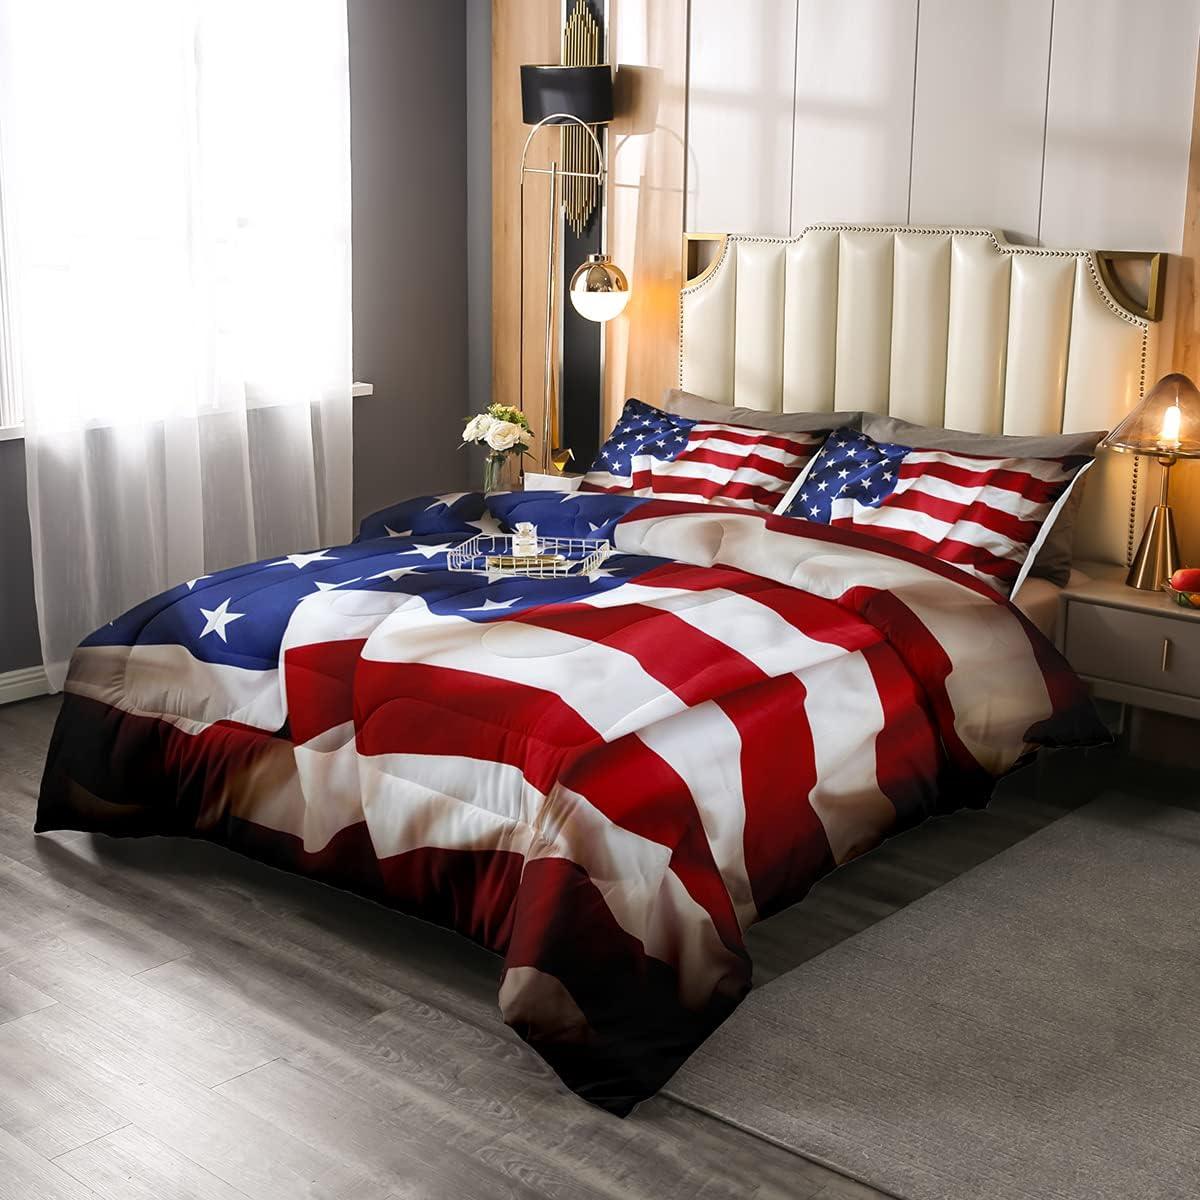 Erosebridal American Recommended Flag Comforter Set States Comf Down Large-scale sale United